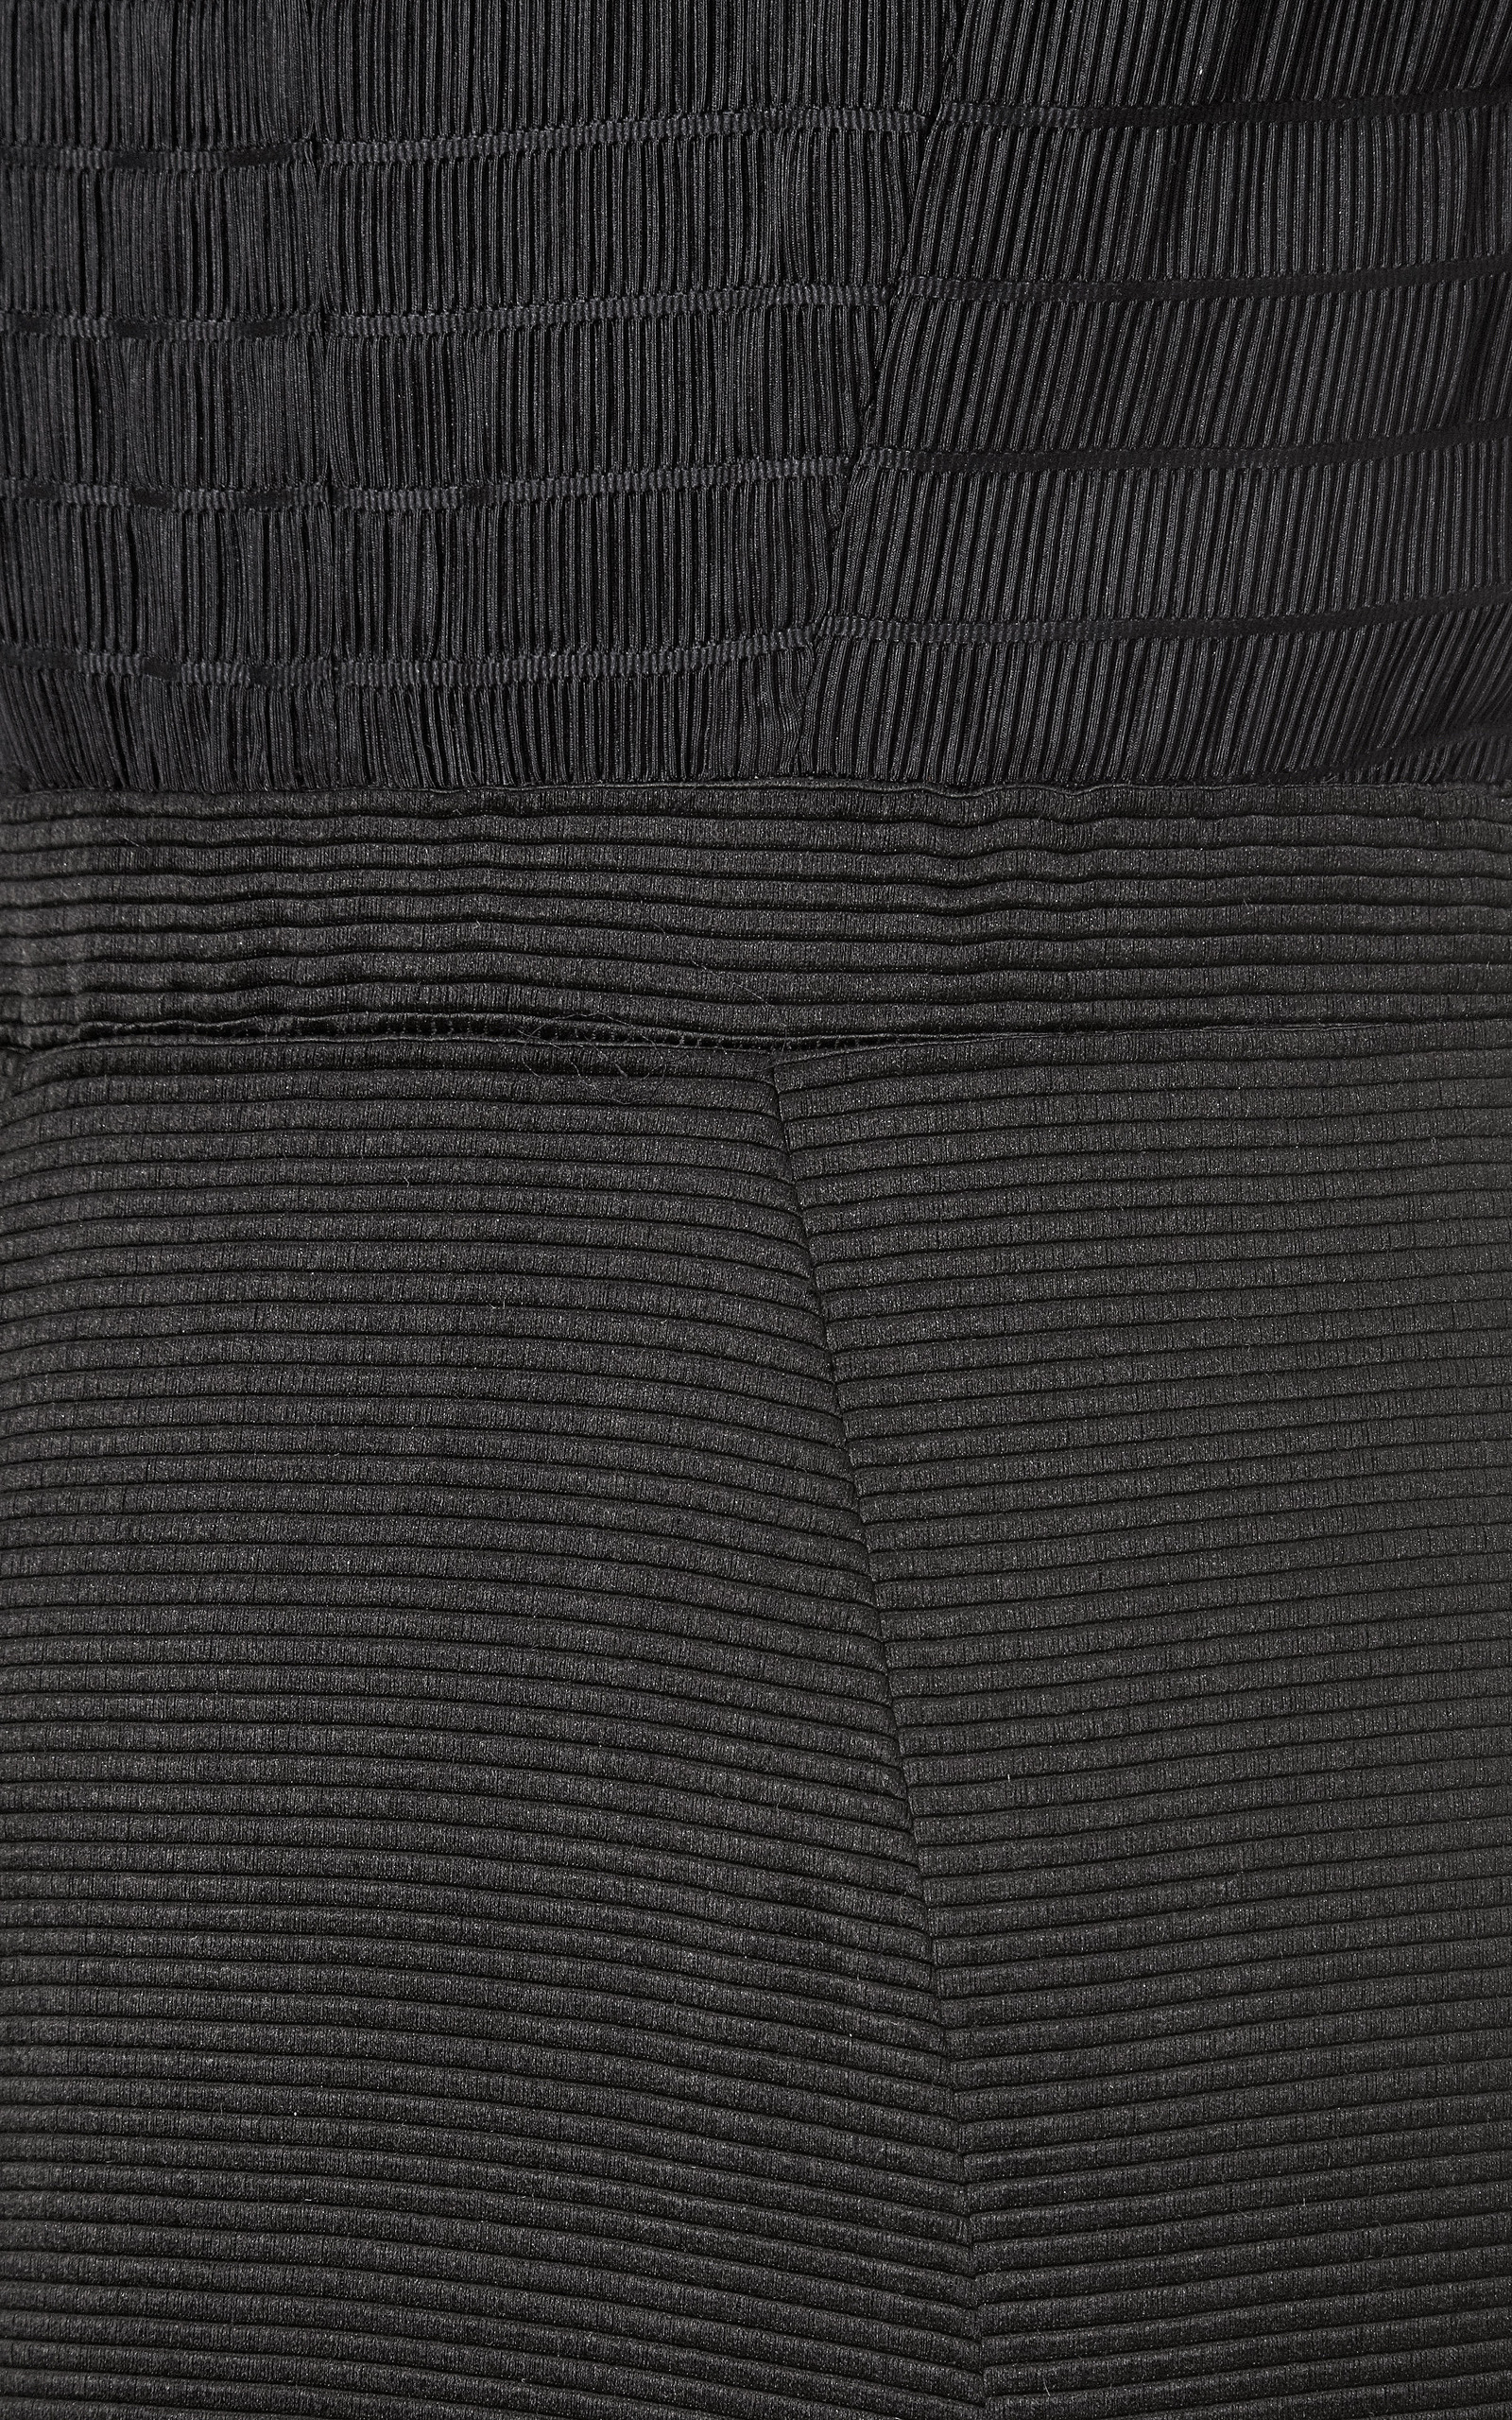 1c5ce8a953ad Katie ErmilioCombo Fishtail Evening Gown. CLOSE. Loading. Loading. Loading.  Loading